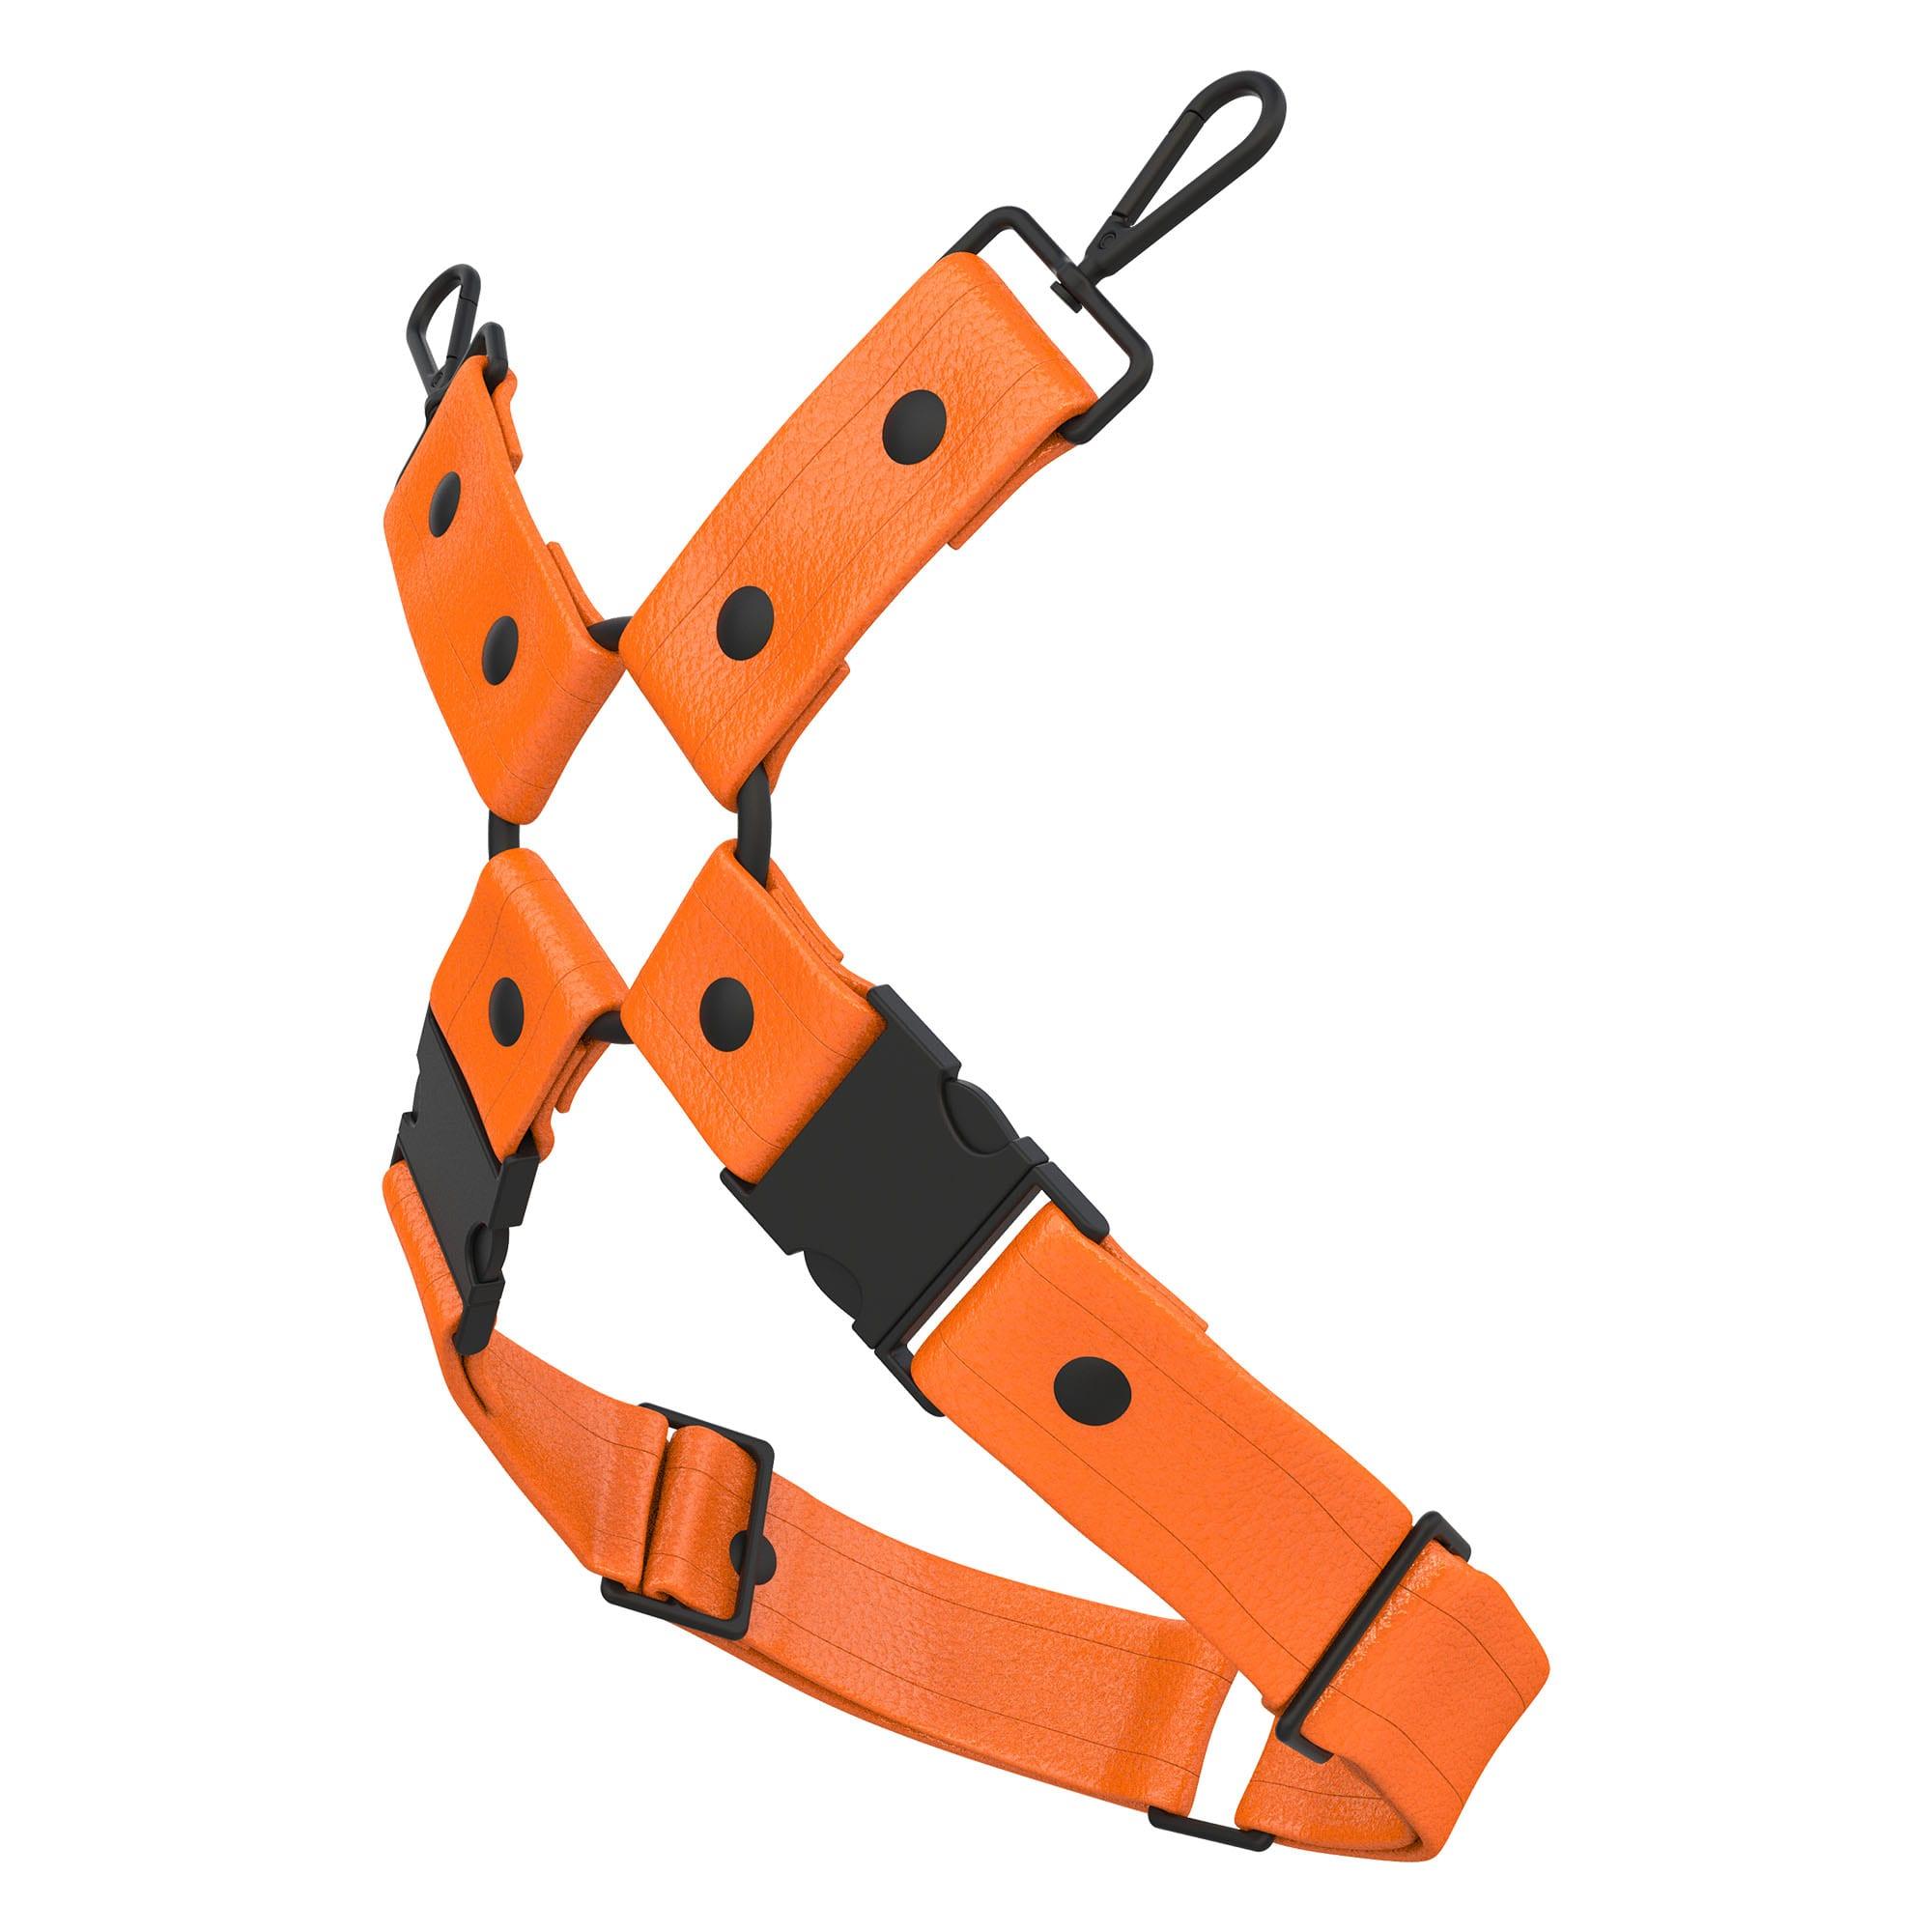 One Size Leg Harness – Standard Leather – Orange - Black Plastic Fittings